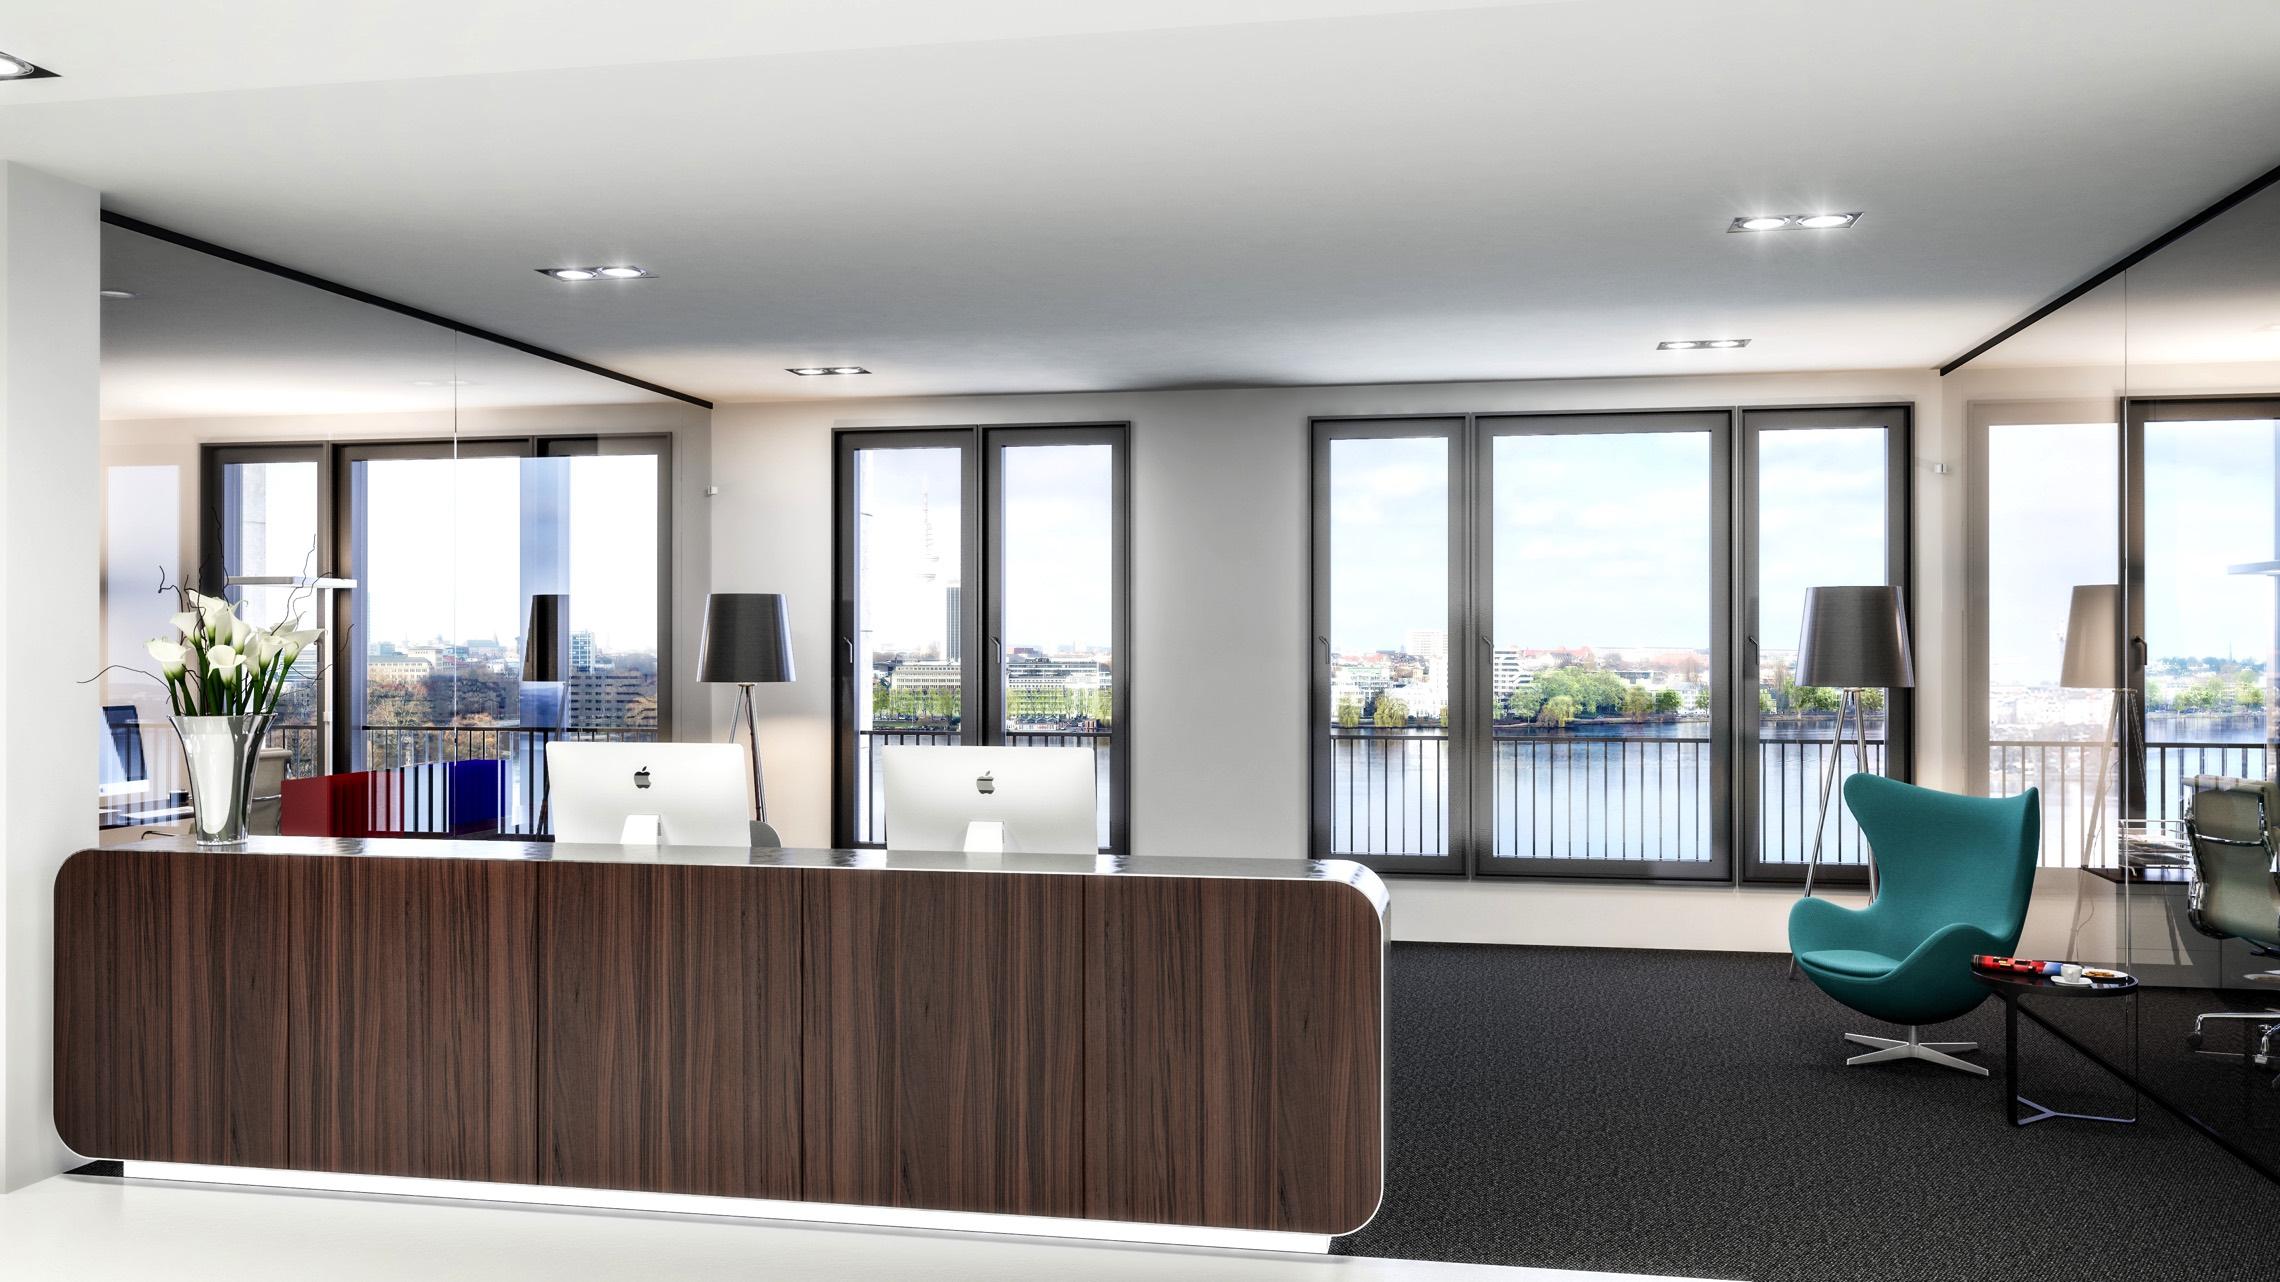 Alstercampus Office Inspiration